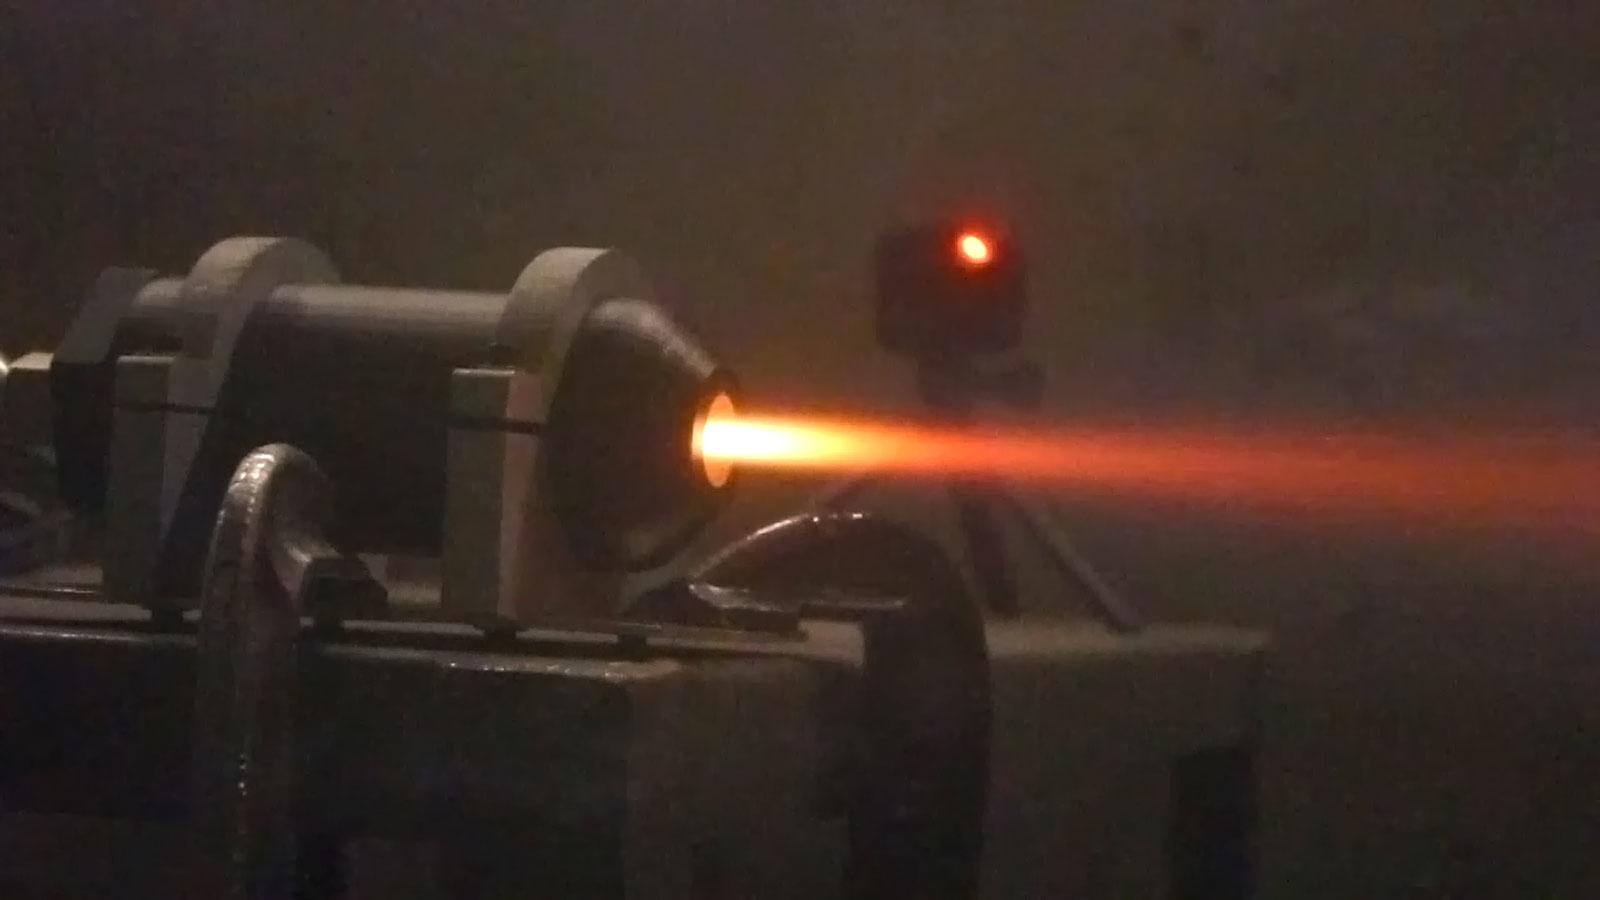 MIT dezlantuie un motor de racheta din plastic printat 3D